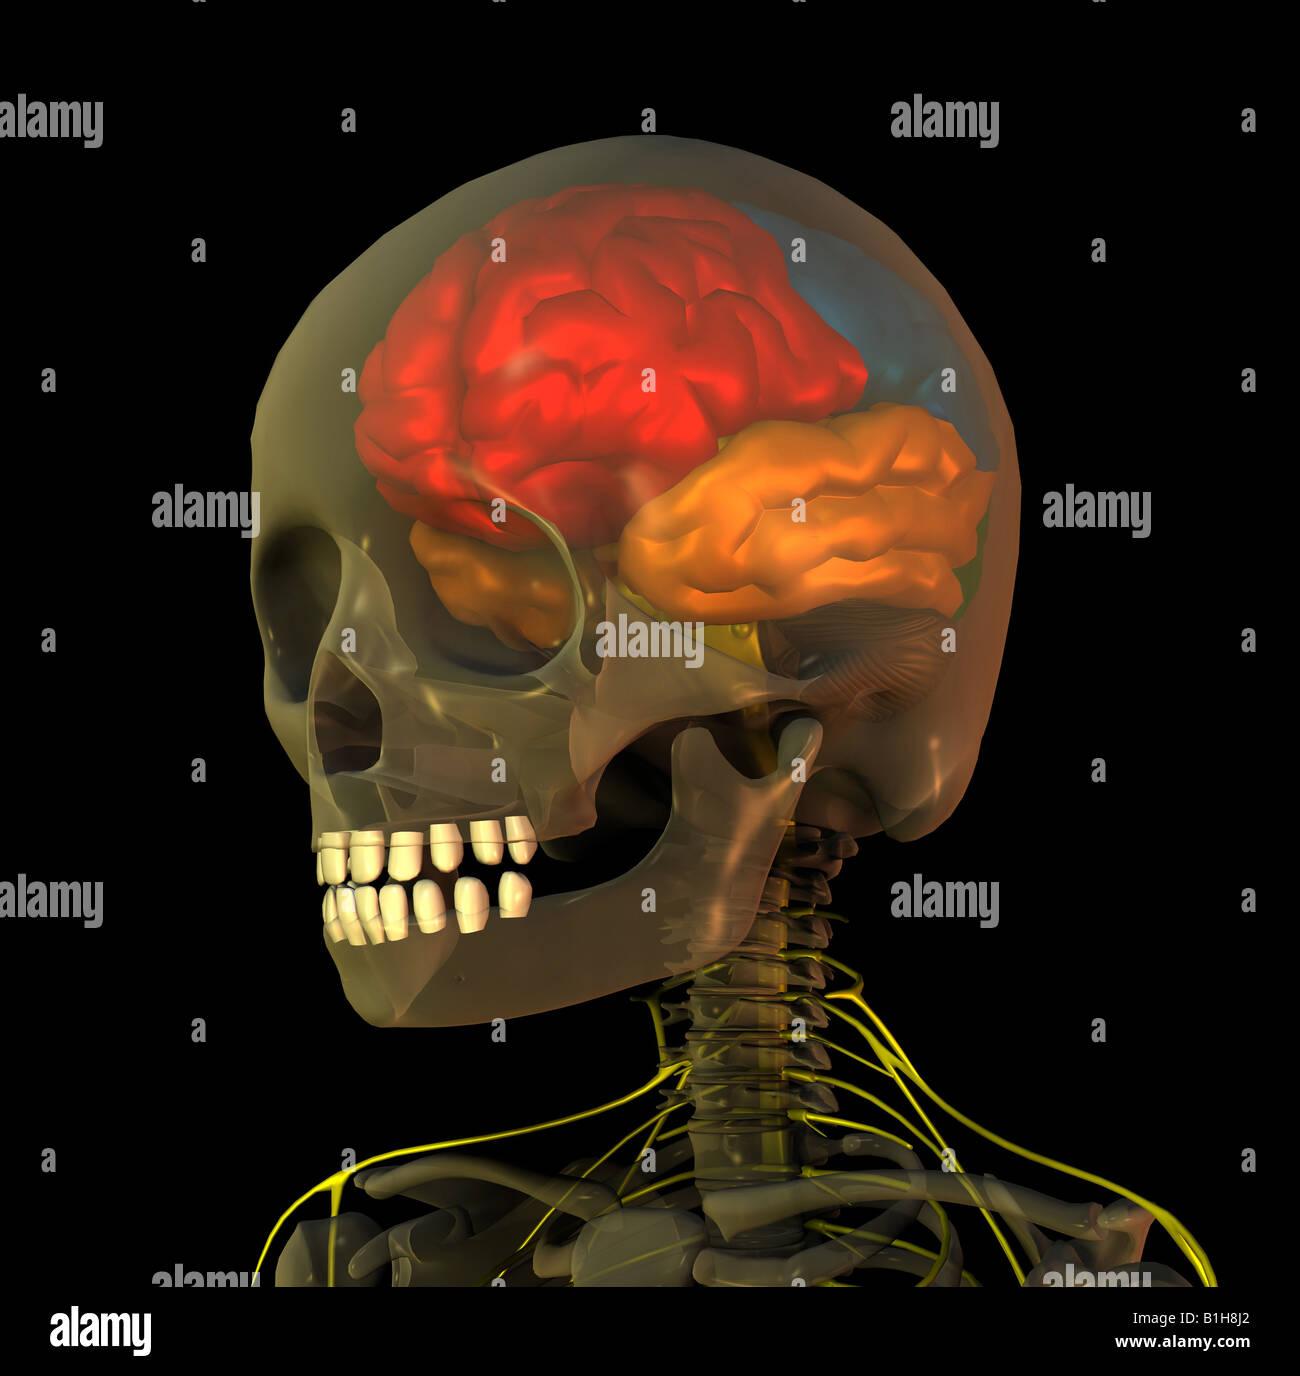 Anatomie Kopf Gehirn Stockfoto, Bild: 18204986 - Alamy